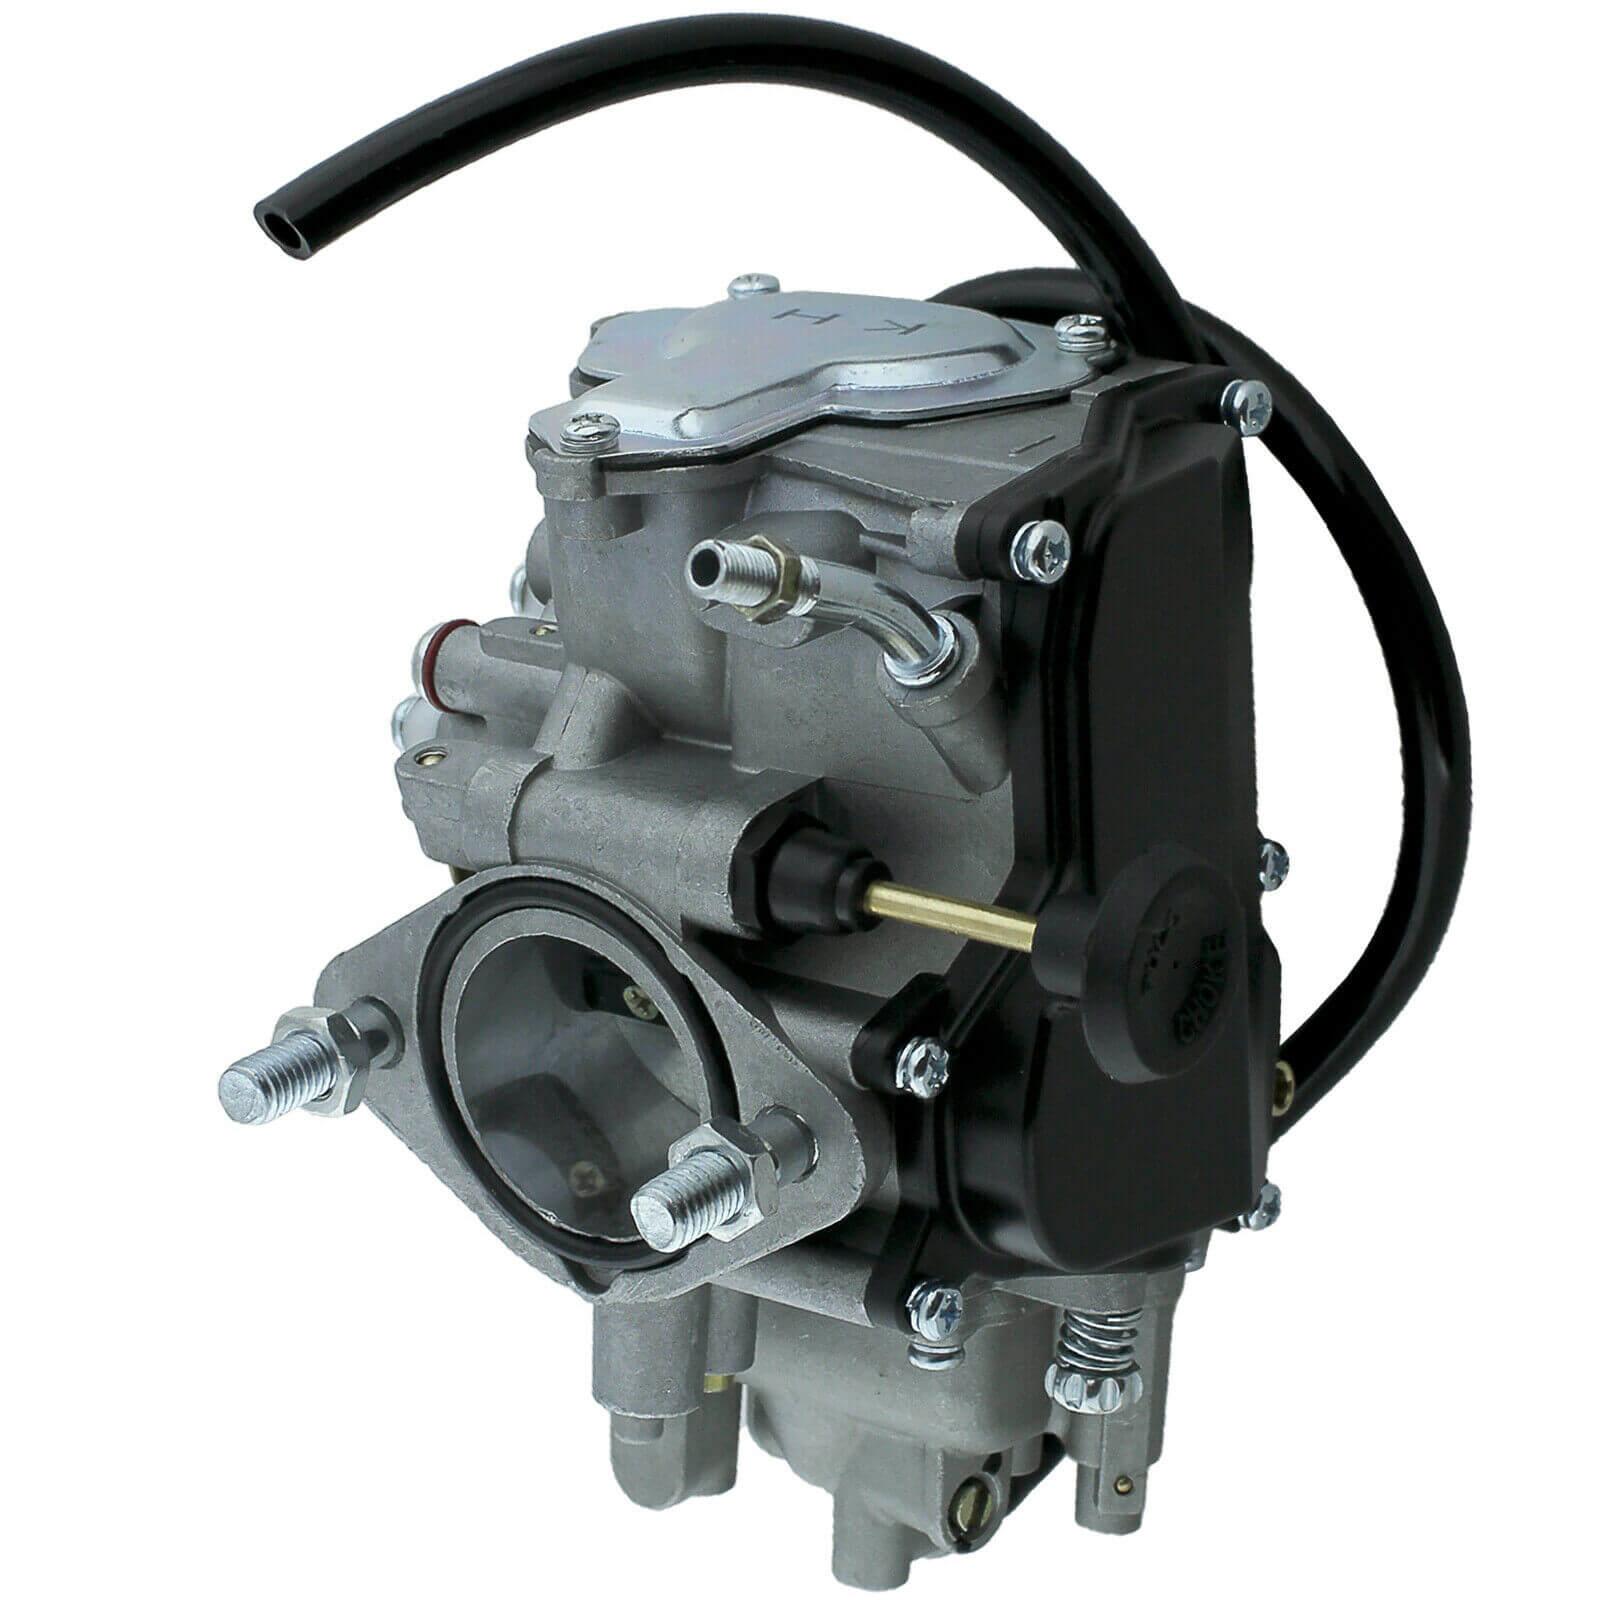 Carburetor For Yamaha Warrior 350 YFM350 1999 2000 2001 2002 2003 2004